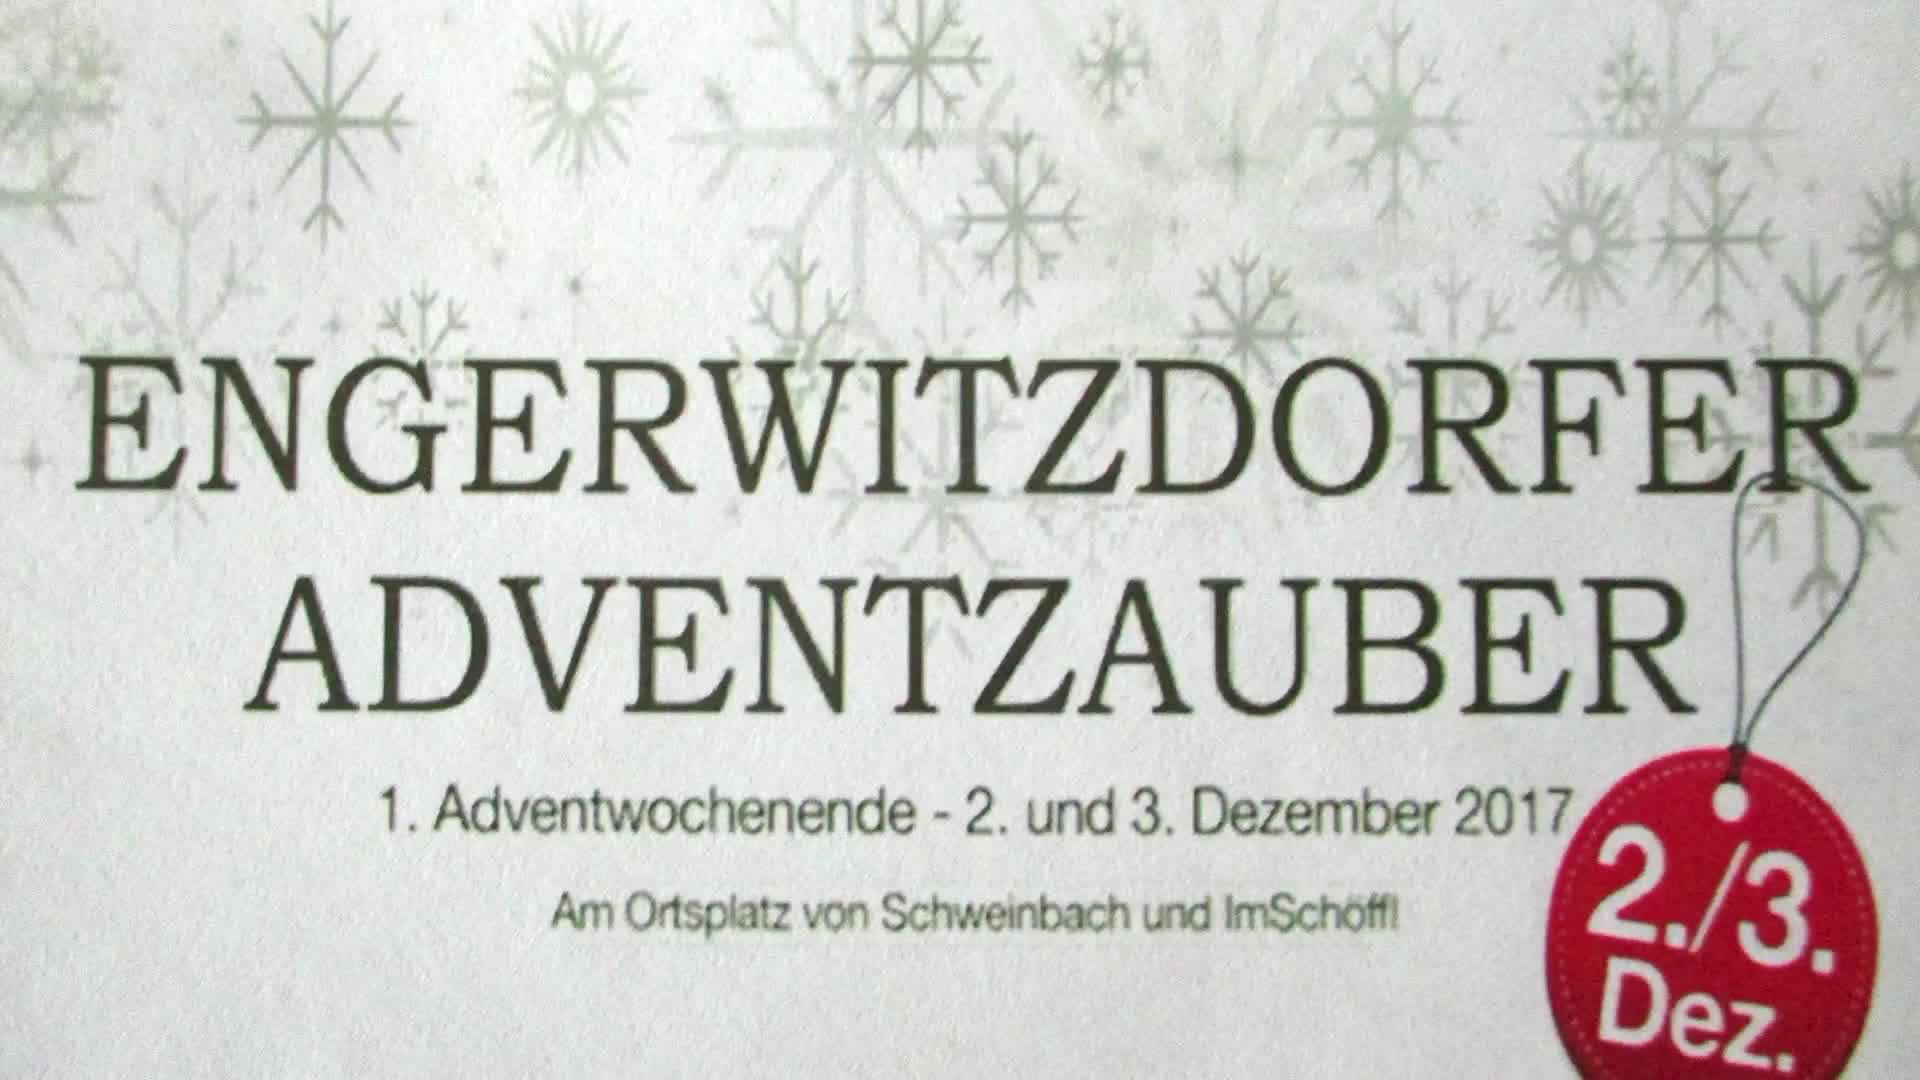 Engerwitzdorfer Adventzauber